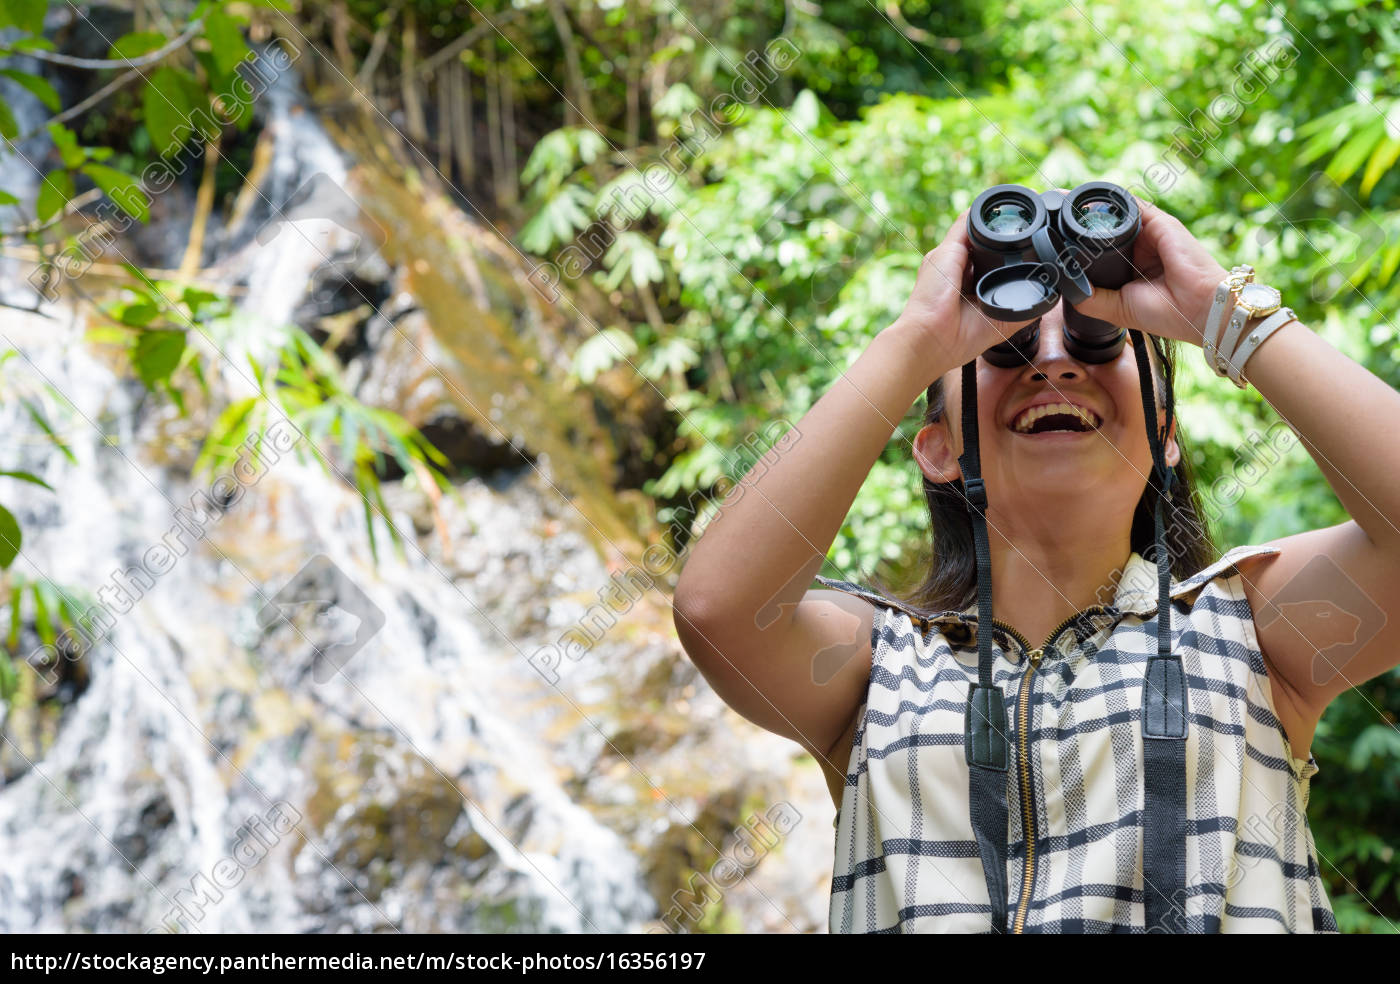 girl, using, binoculars, in, forest - 16356197